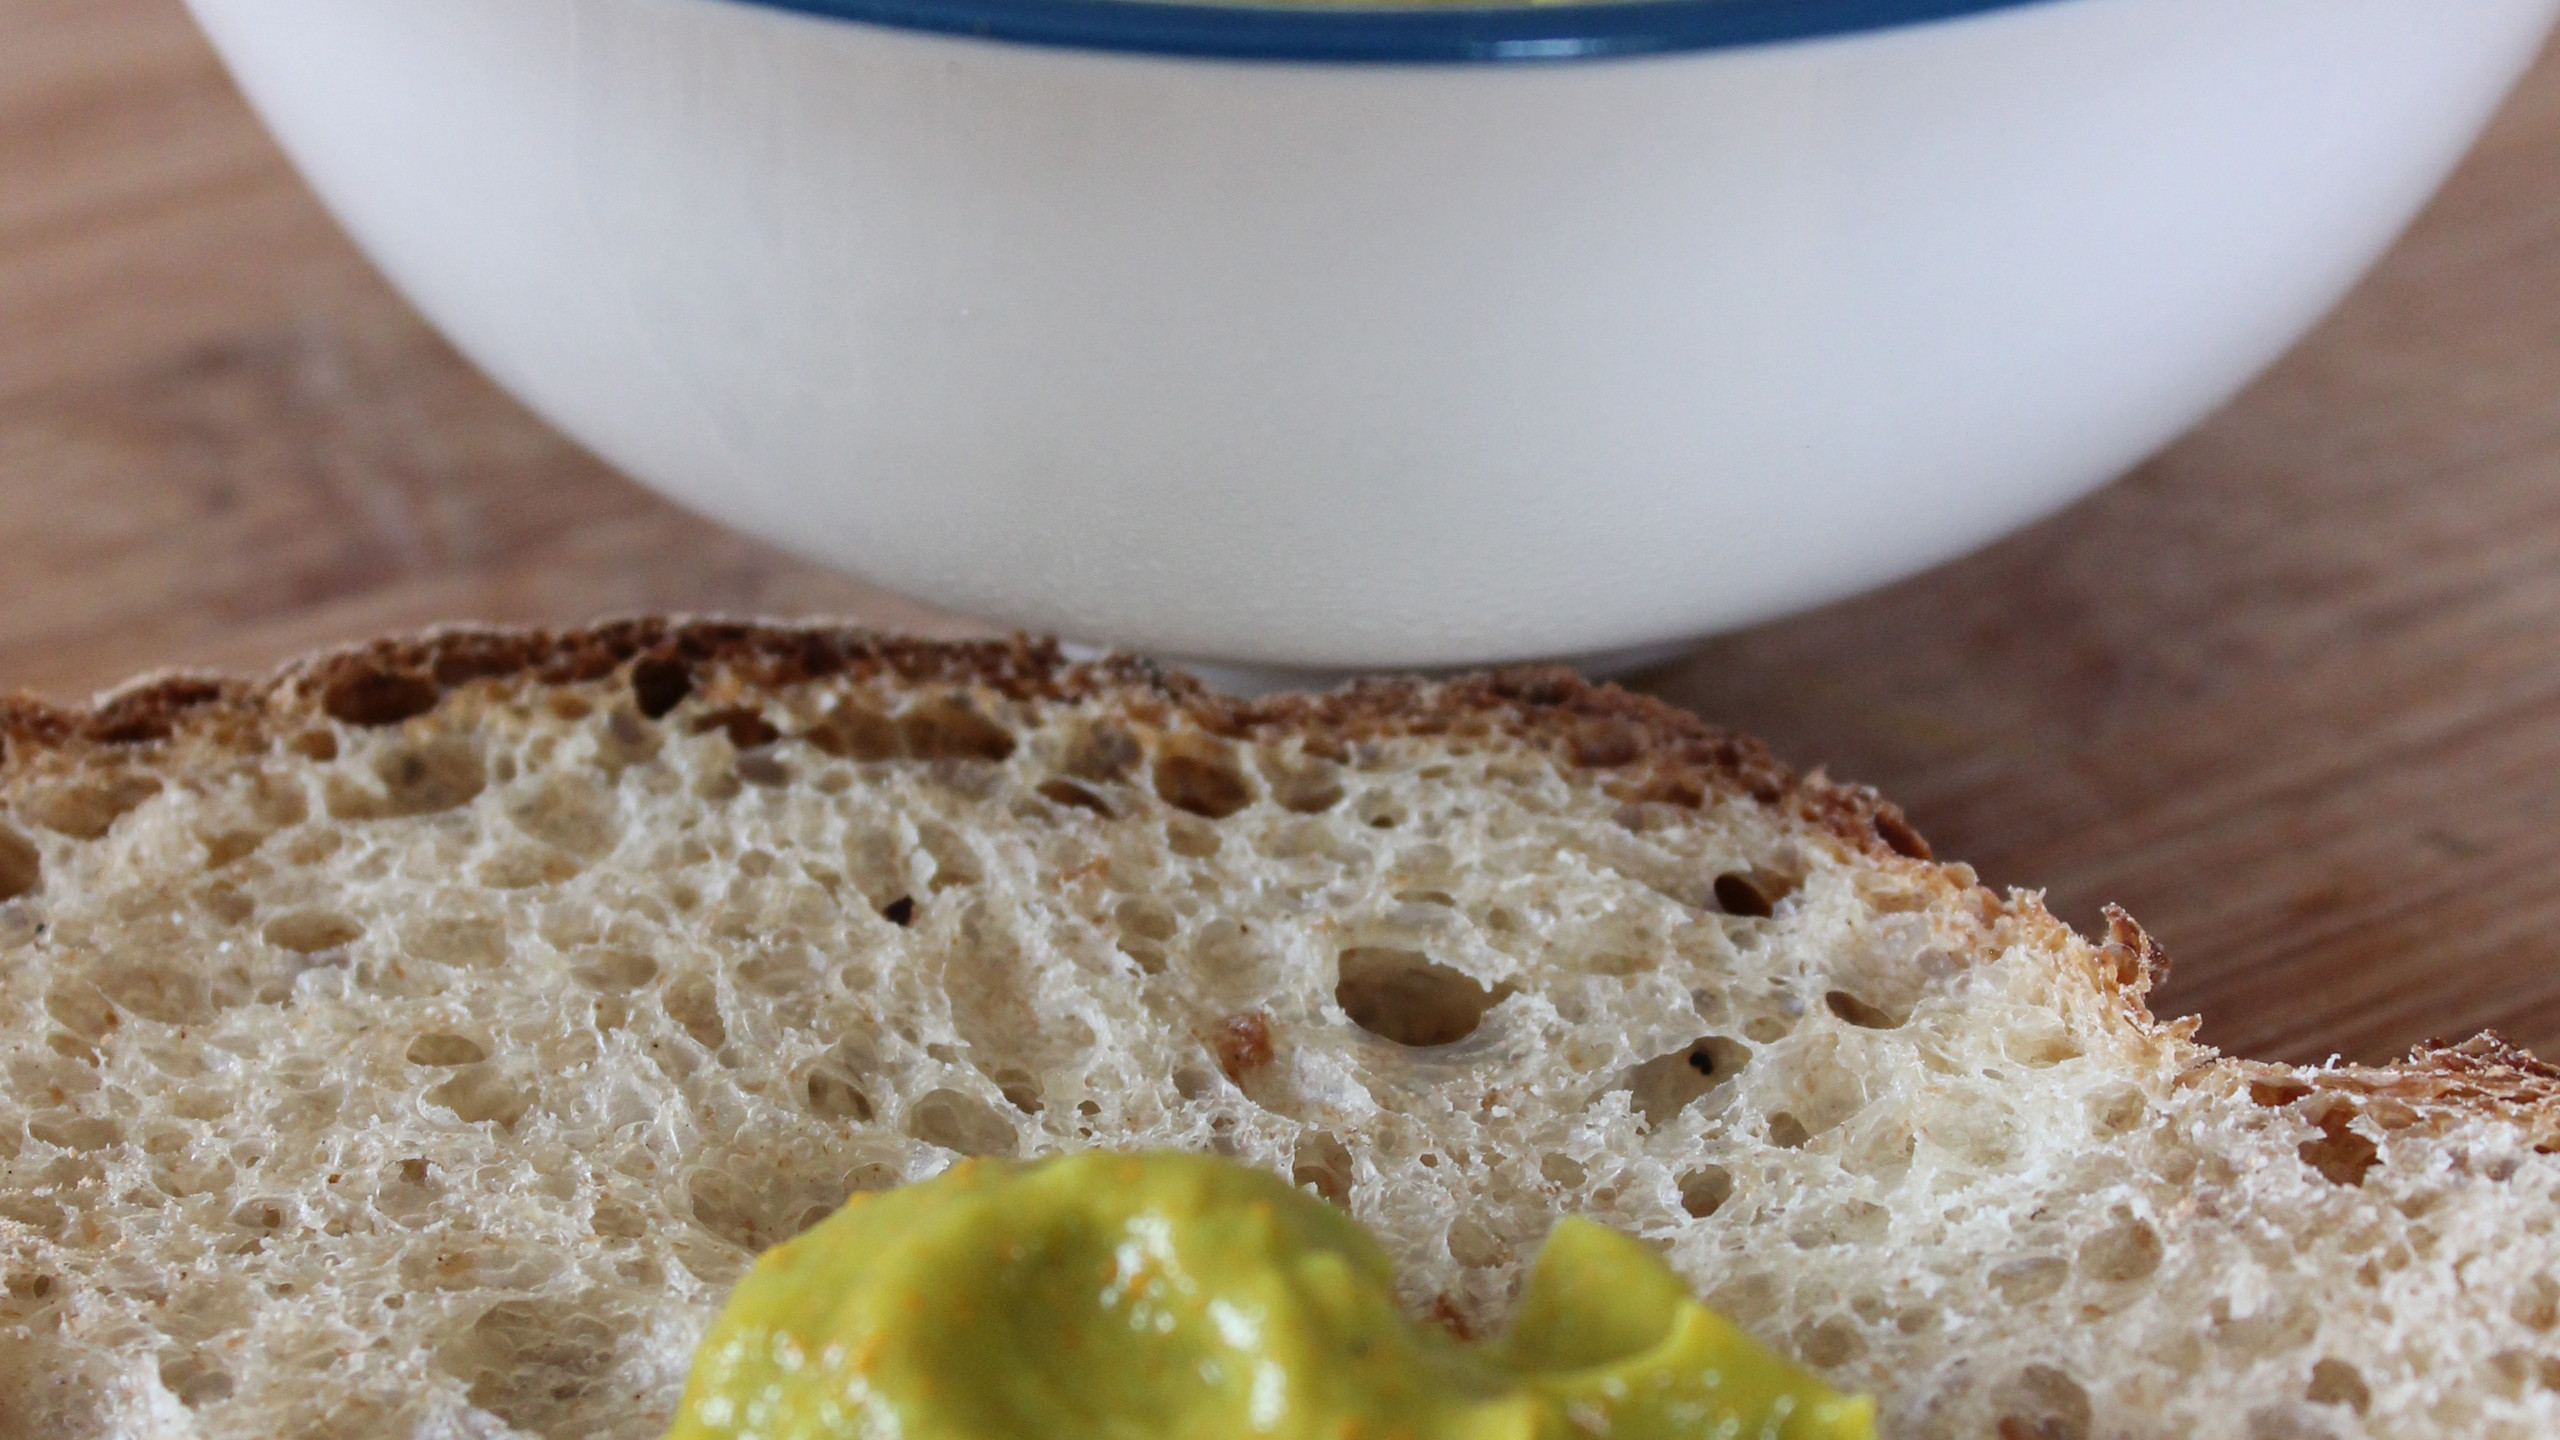 Zingy Turmeric & Avocado Spread